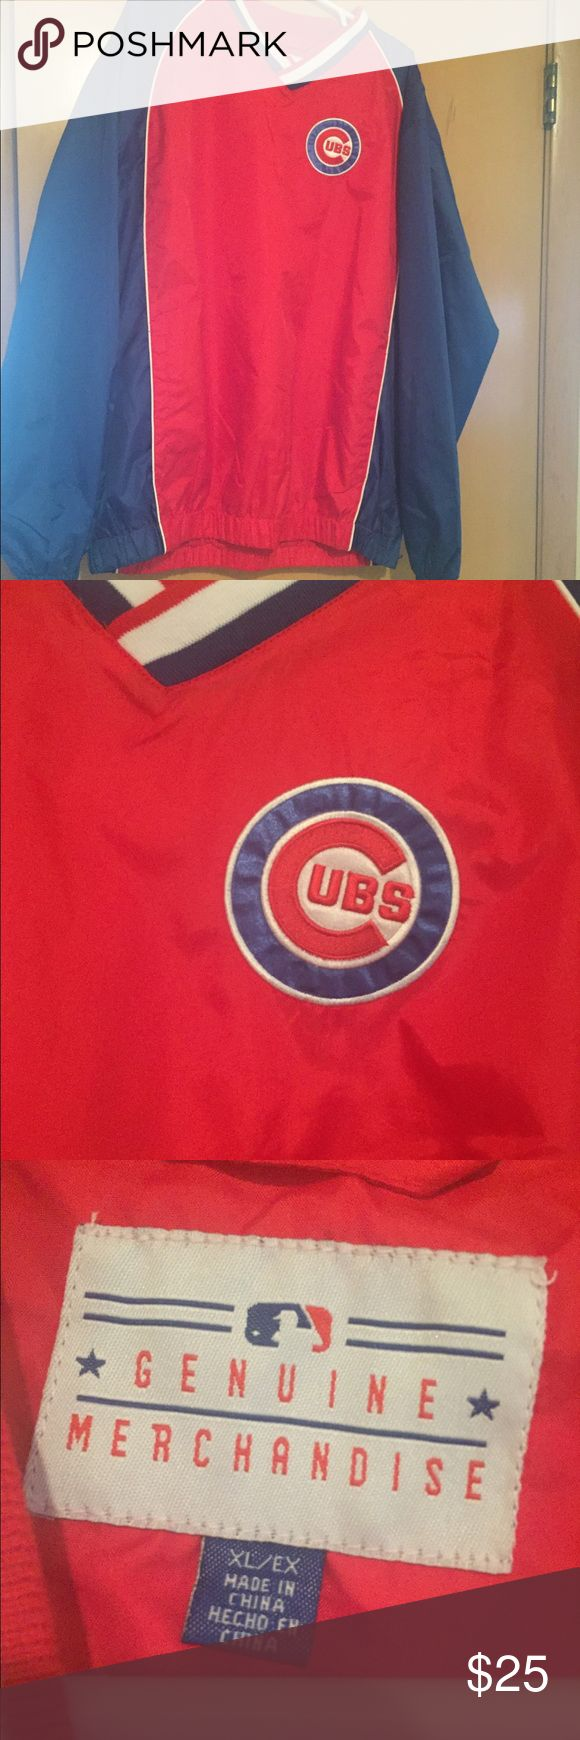 Cubs windbreaker New never worn Cubs wind/rain jacket MLB merchandise Jackets & Coats Utility Jackets